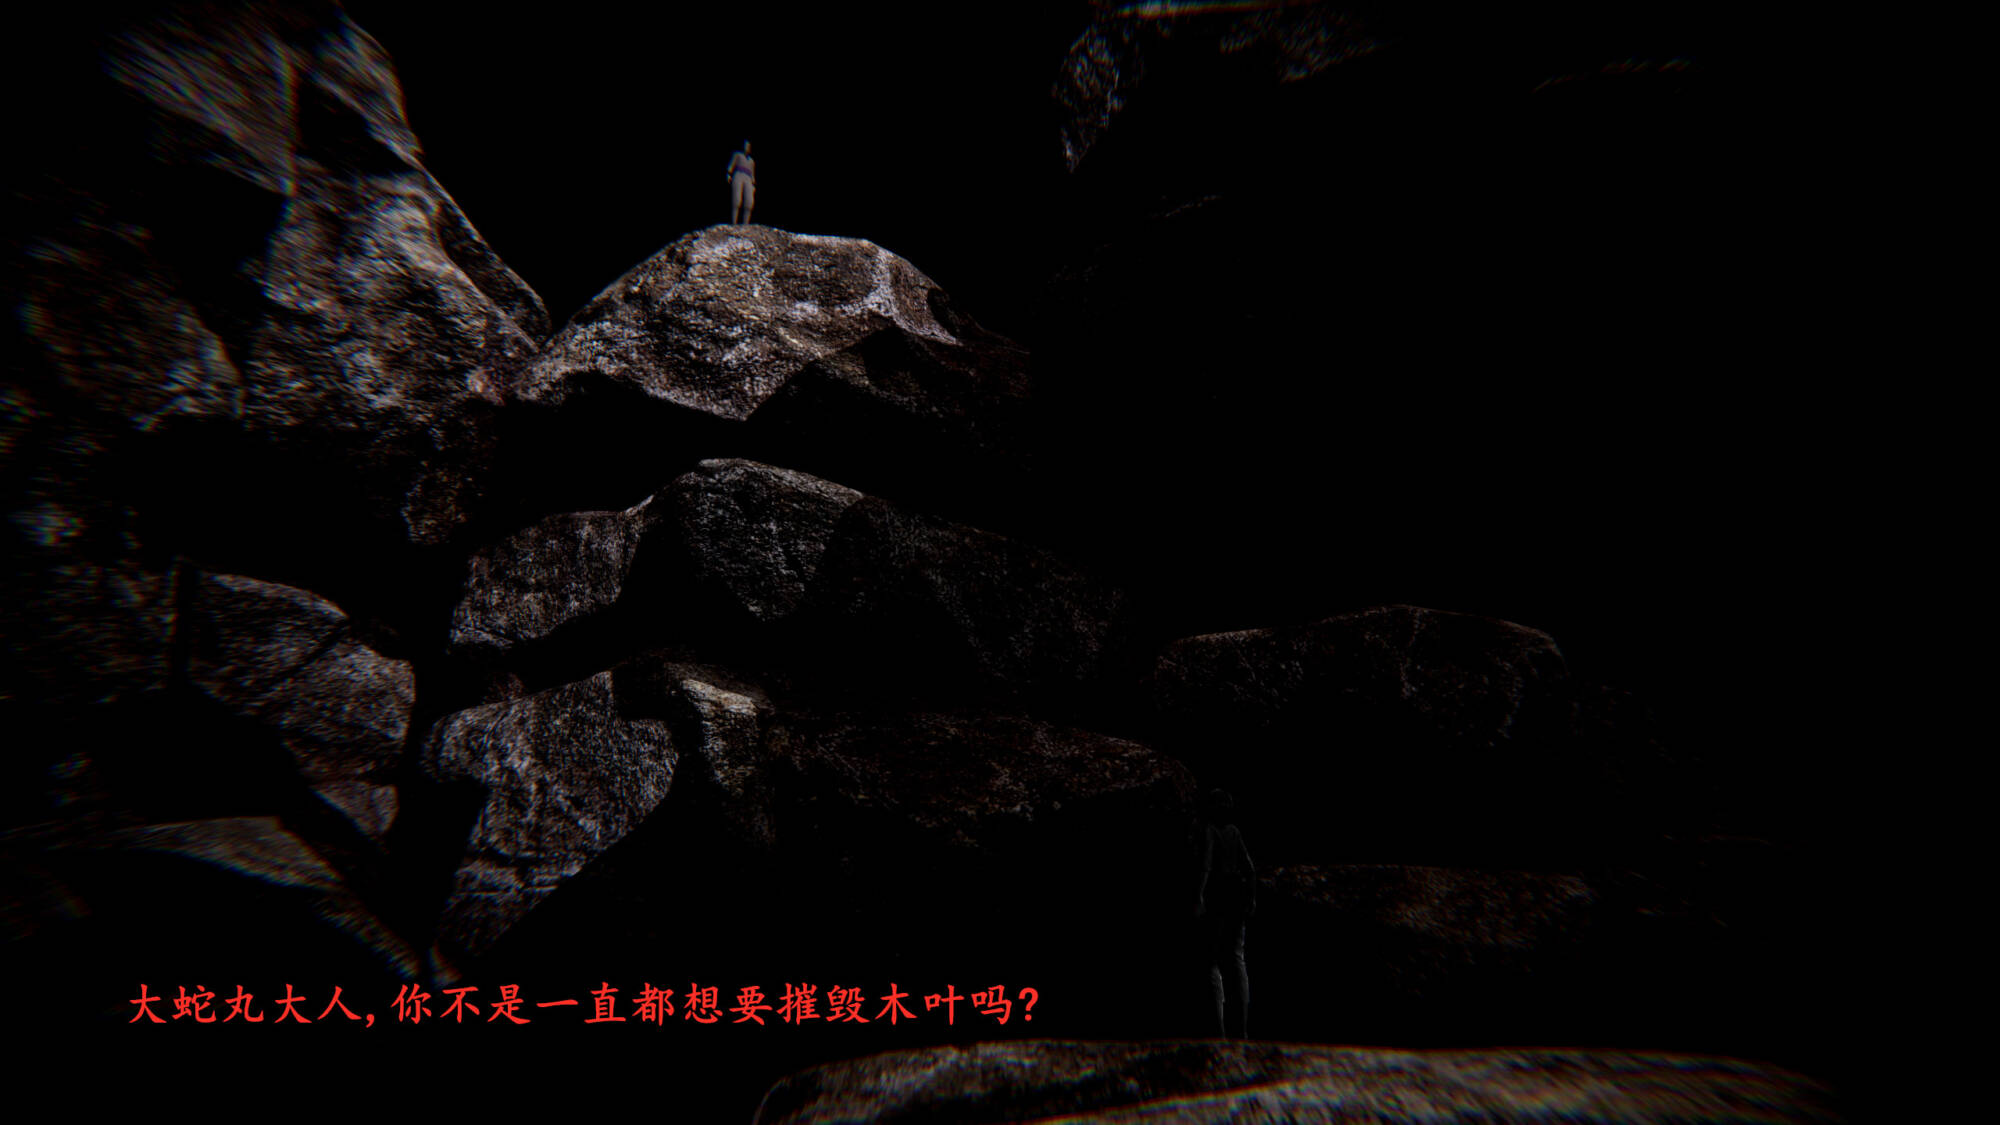 漫游狂想曲 - 6 纲手最期 (Chinese) - page004 Naruto,  xxx porn rule34